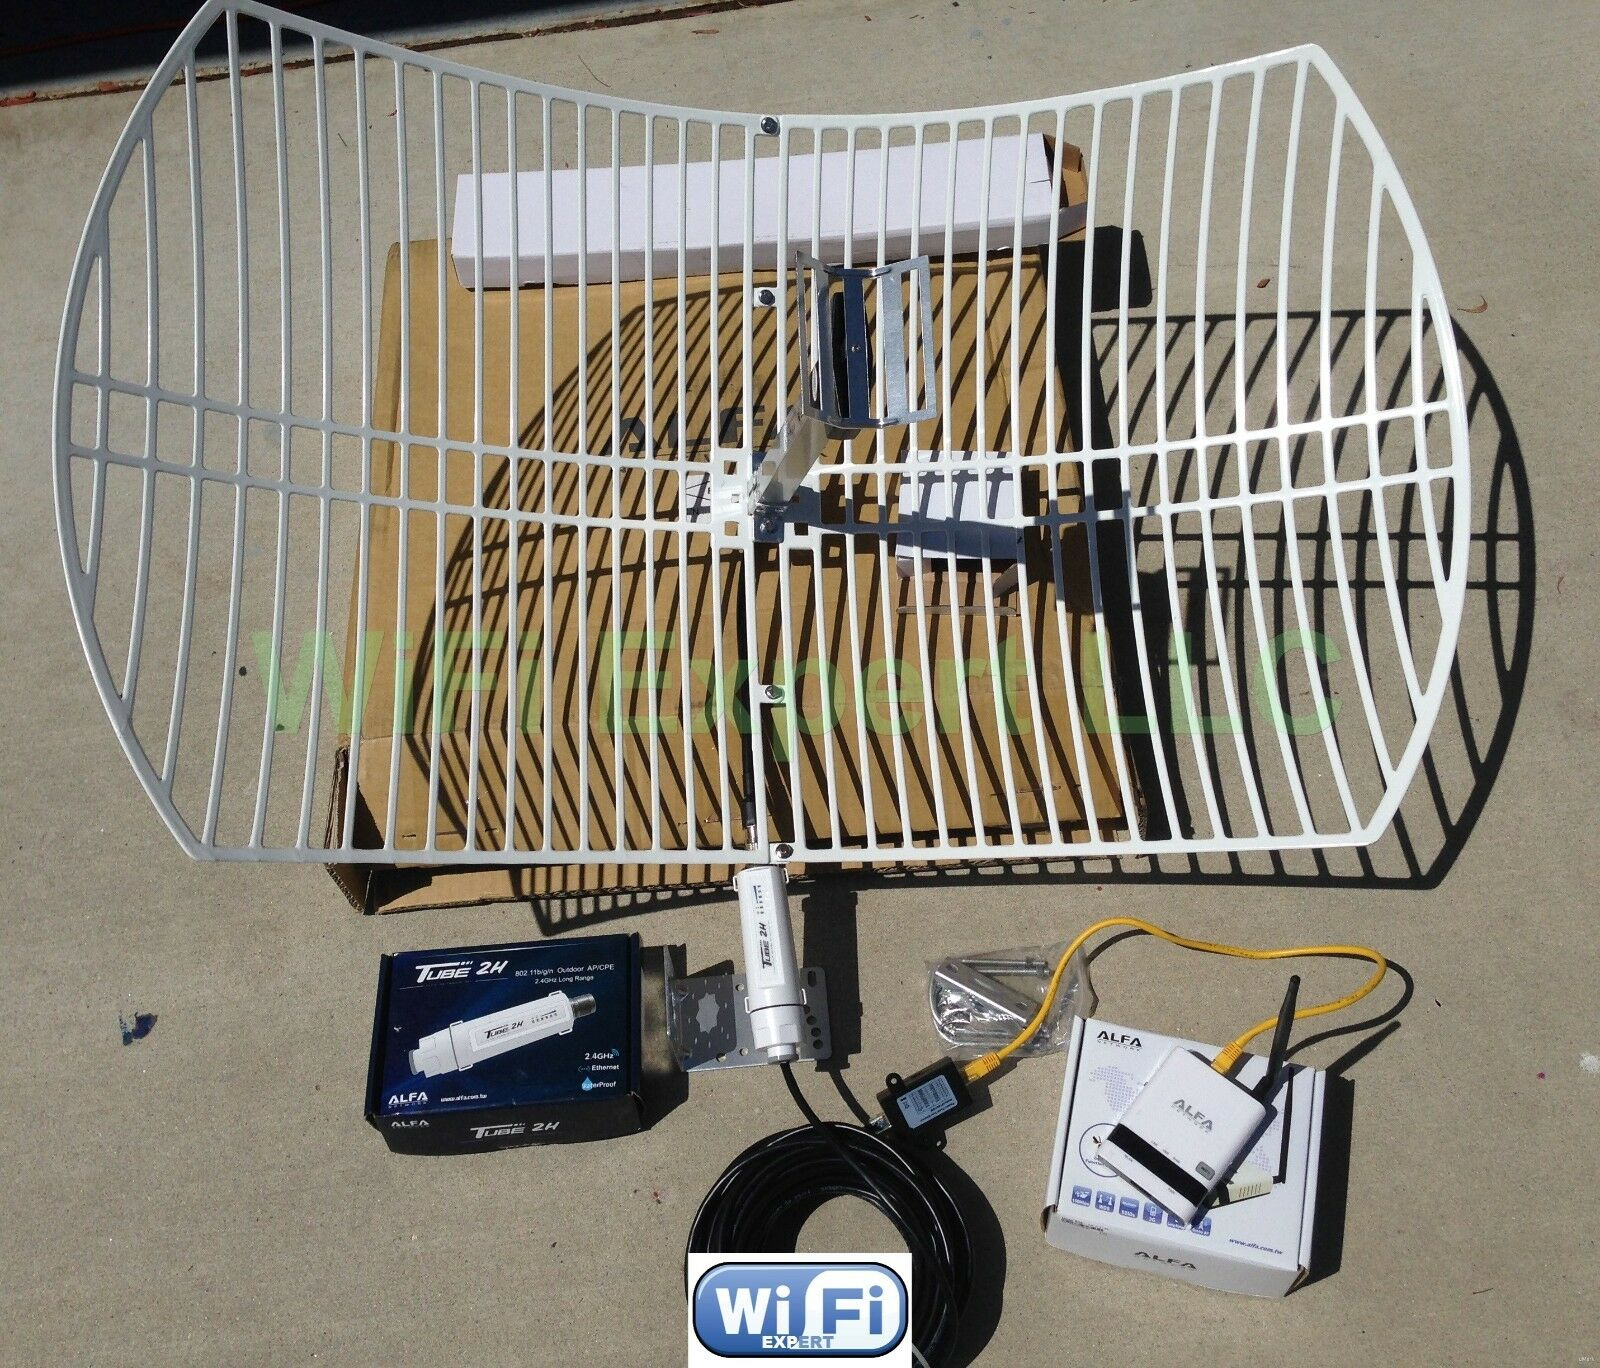 ALFA R WiFi Antn dBi TUBE 2H PoE Cat5e Outdoor Booster GET